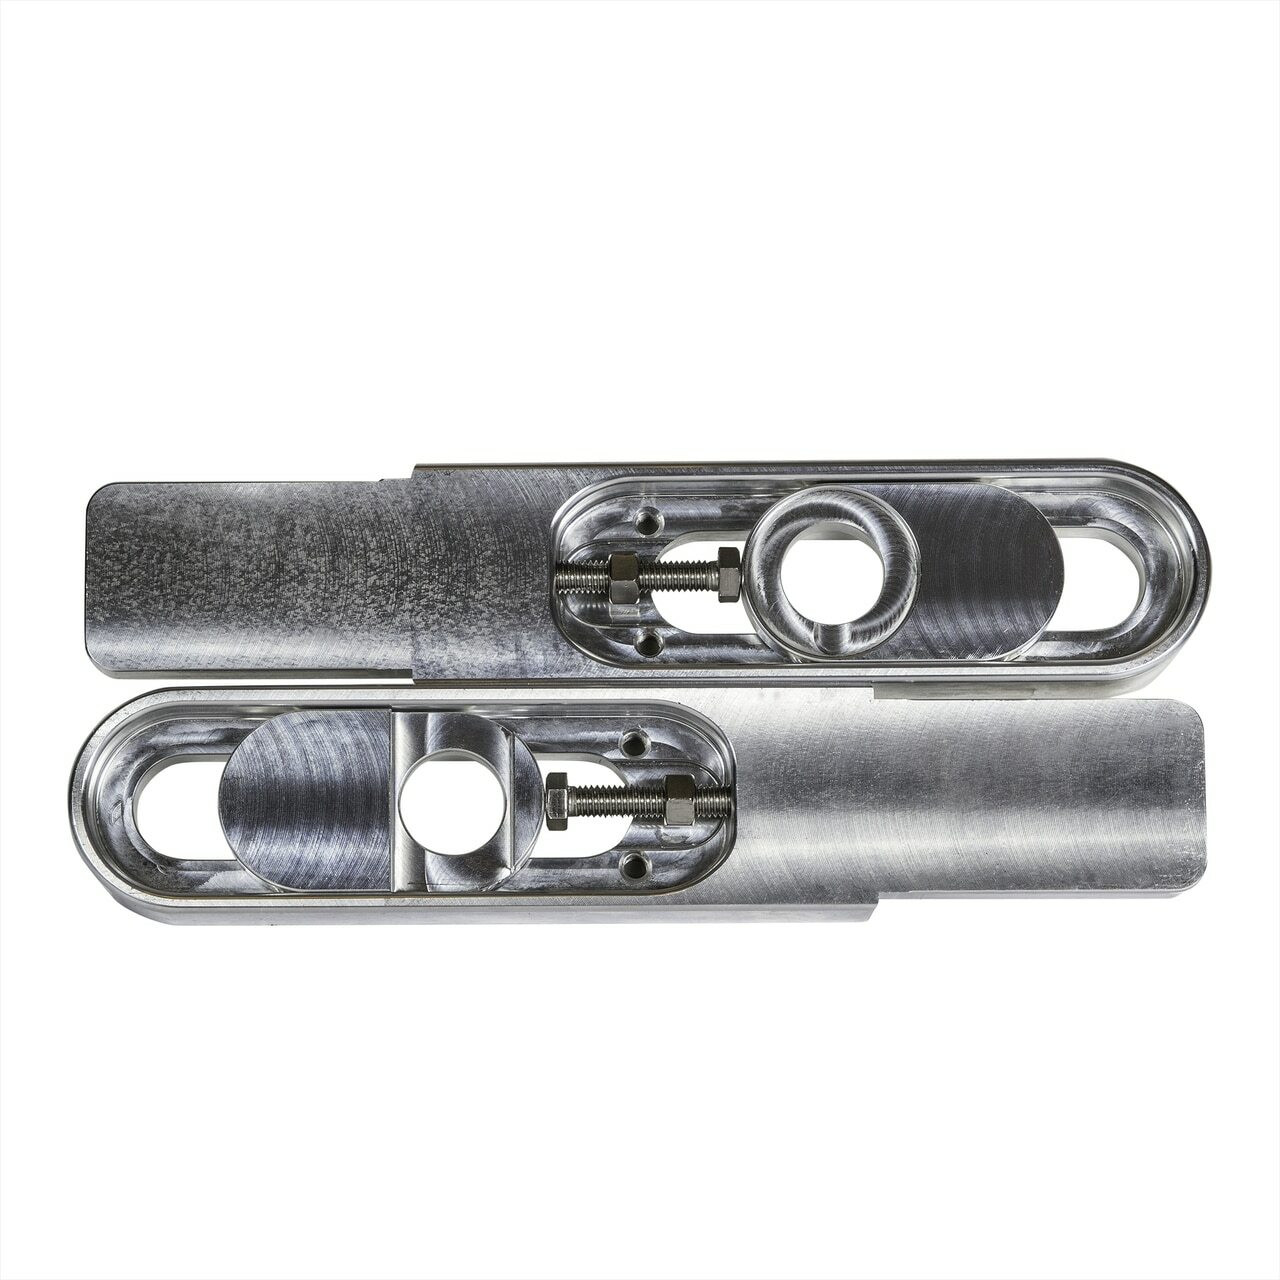 GSXR 1000 Swingarm Extensions